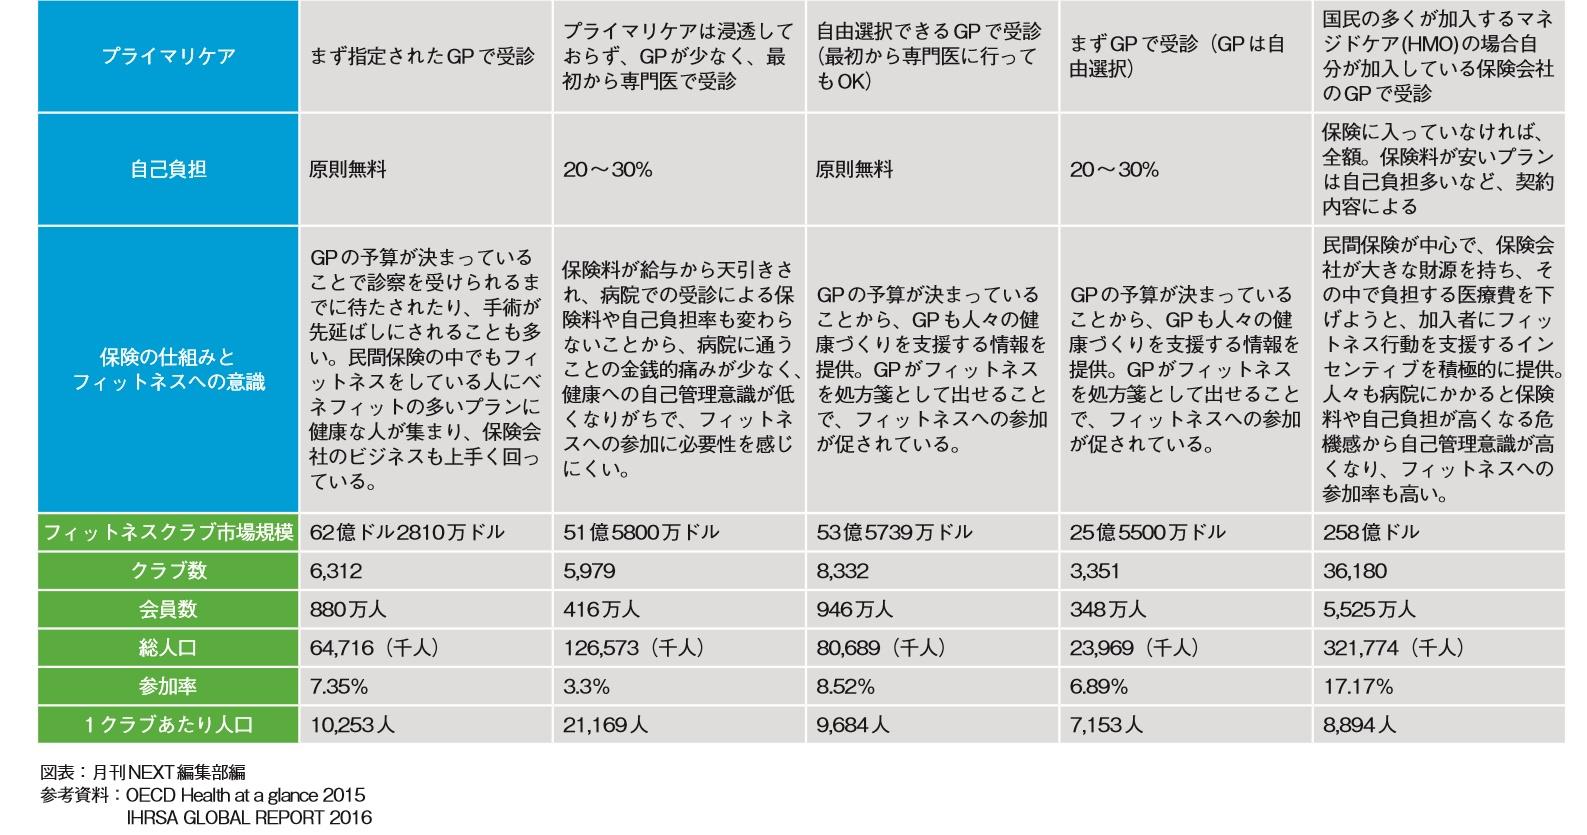 12%e6%9c%88%e7%89%b9%e9%9b%86%e2%91%af